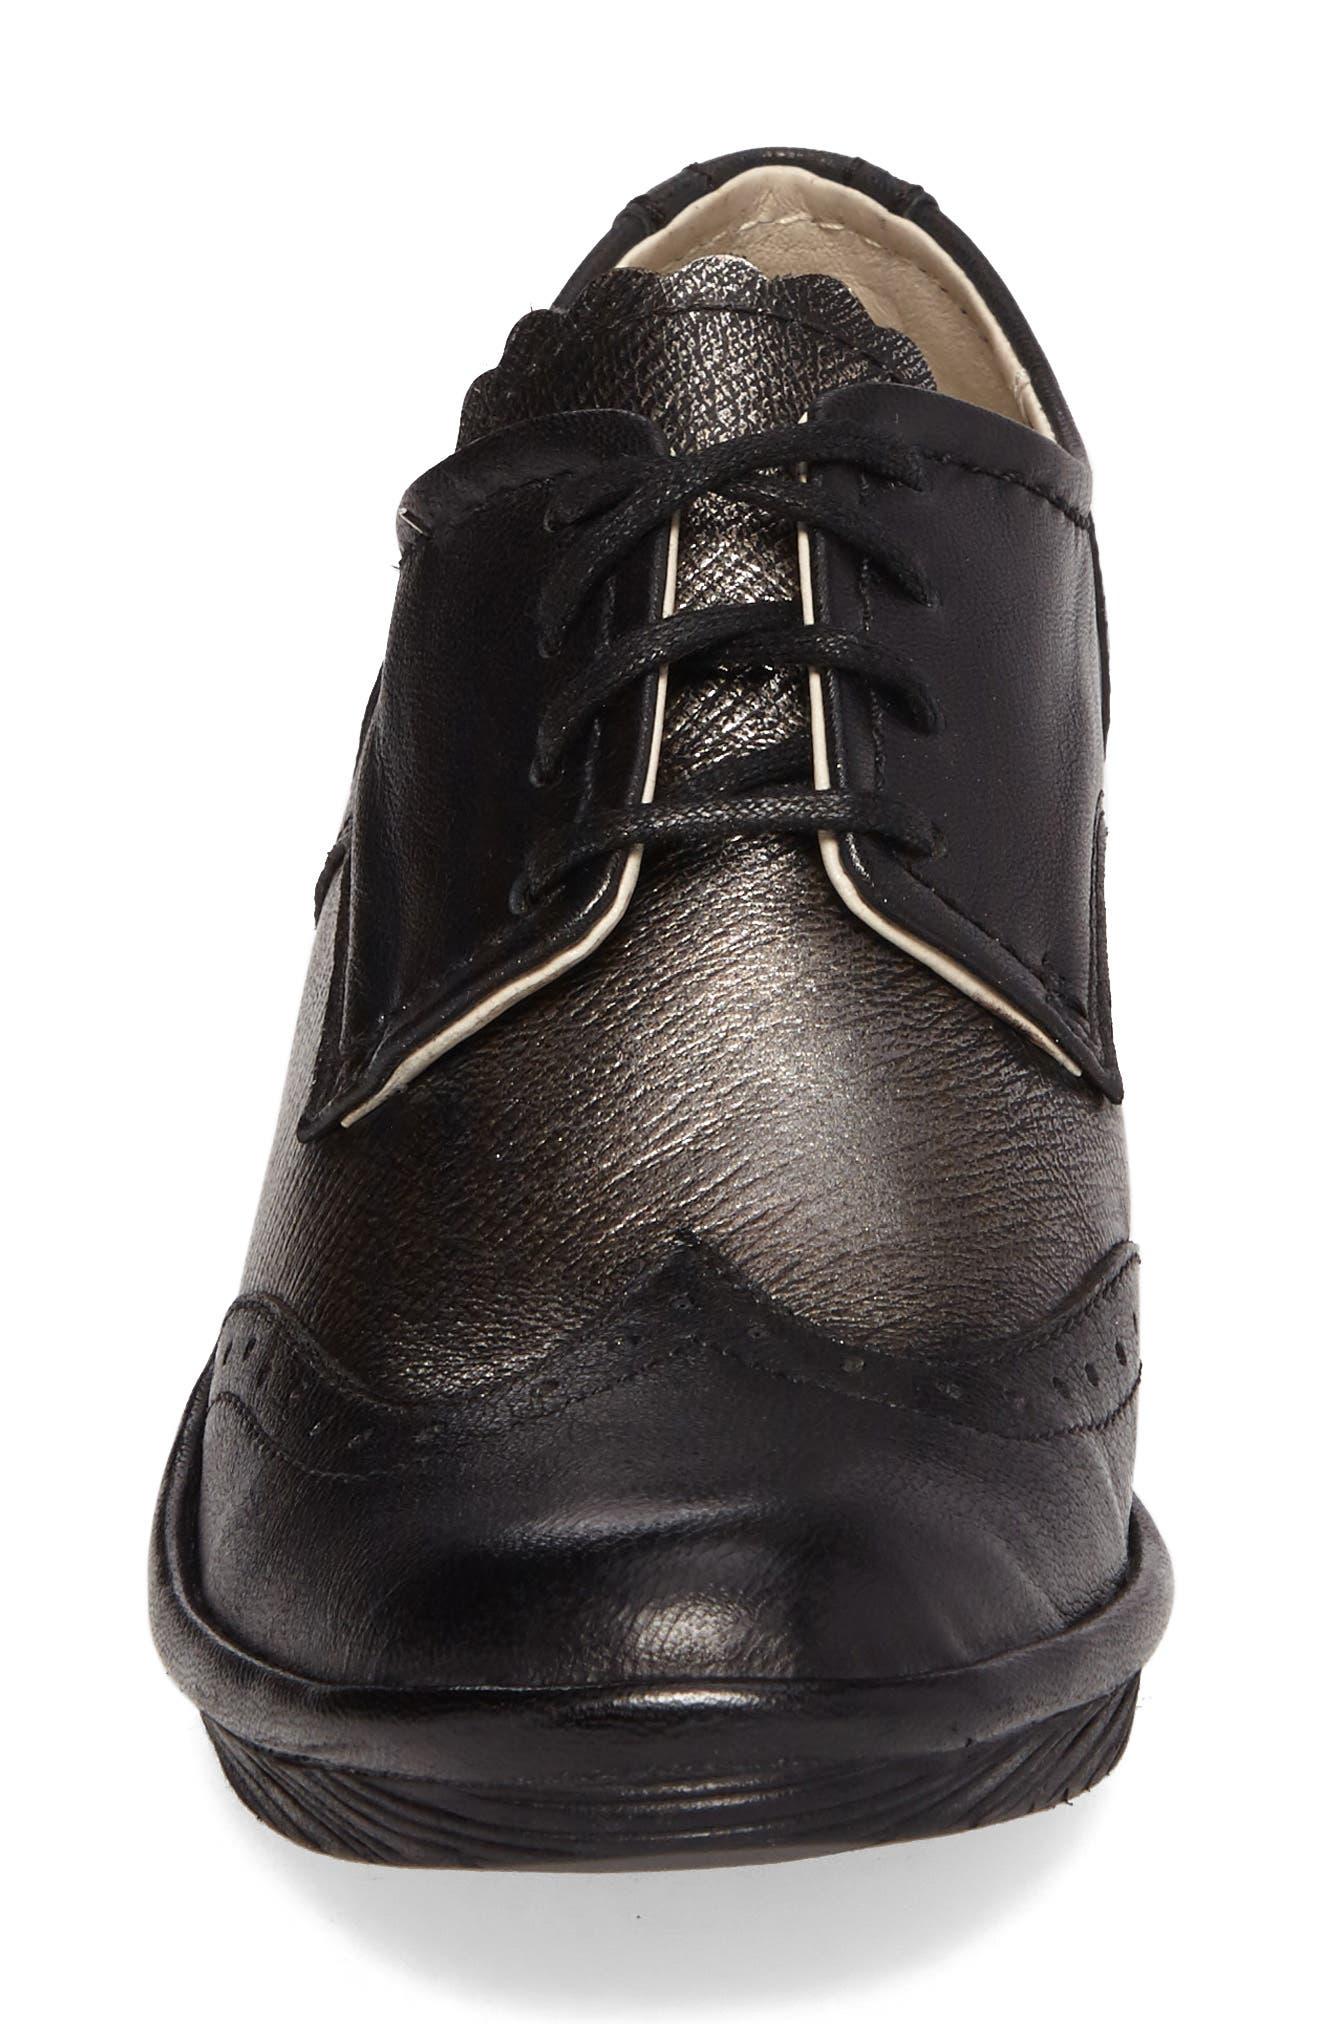 'Palt' WedgePump,                             Alternate thumbnail 4, color,                             Black/ Antique Silver Leather